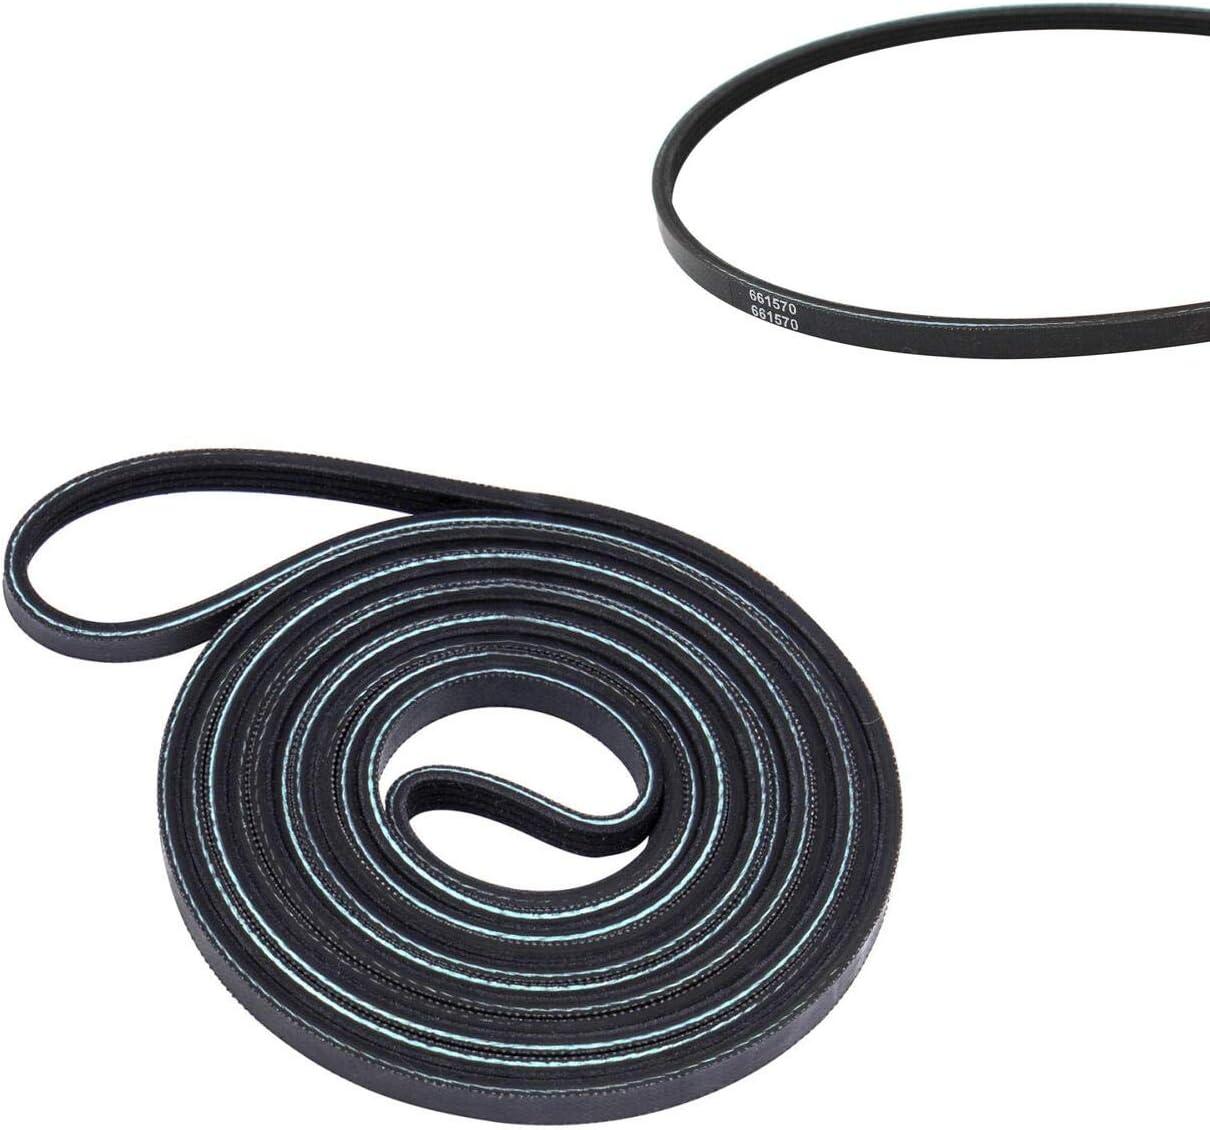 "2 Pack 93.5/"" Length, 1//4/"" Wide, 5 Ribs New 661570V Dryer Drum Belt"